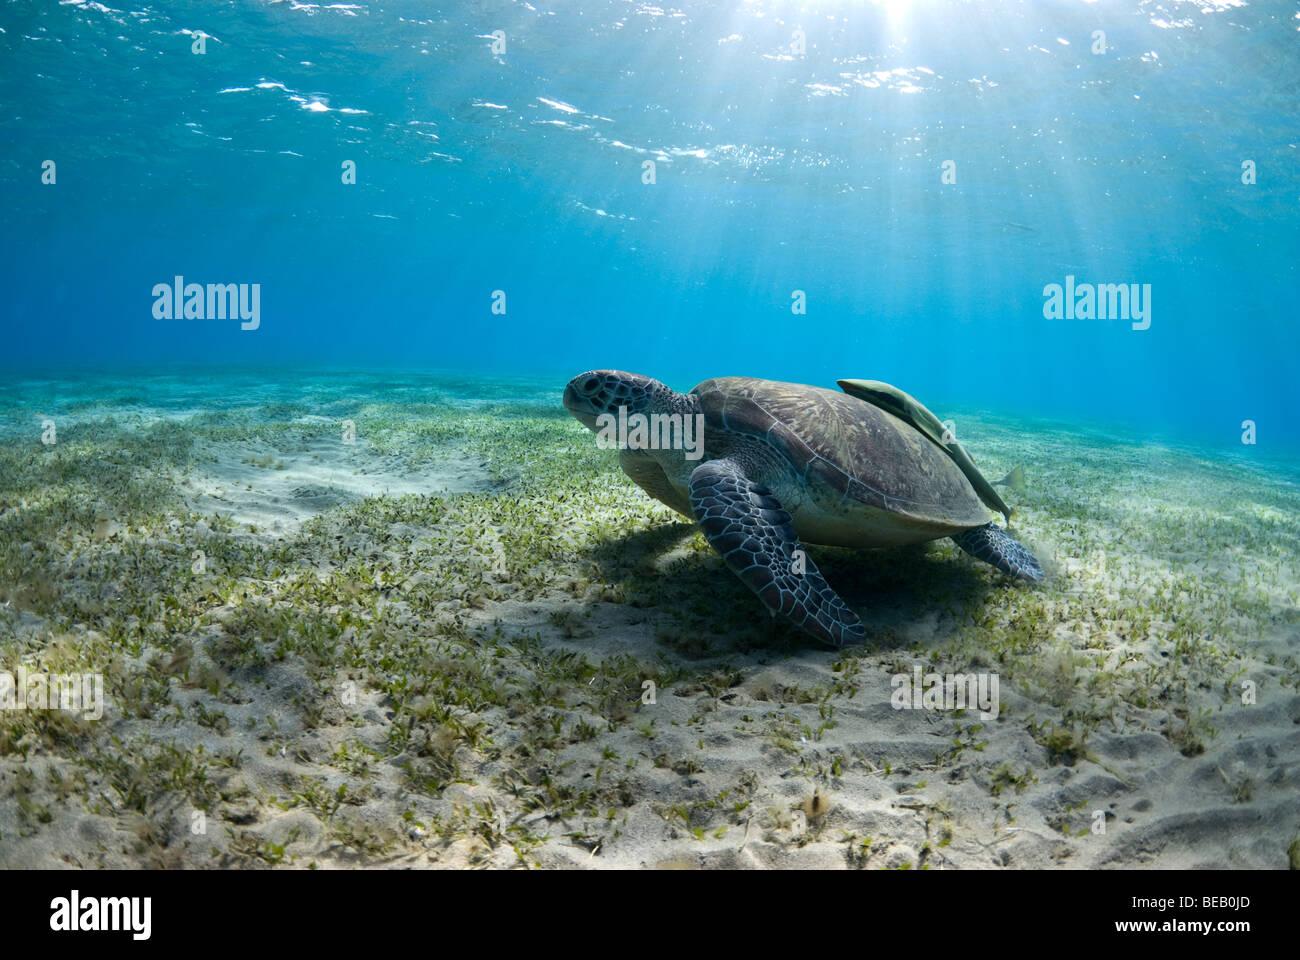 Tortue de mer verte qui se nourrissent de l'herbe marine dans la baie Shallow. Chelonia mydas Photo Stock